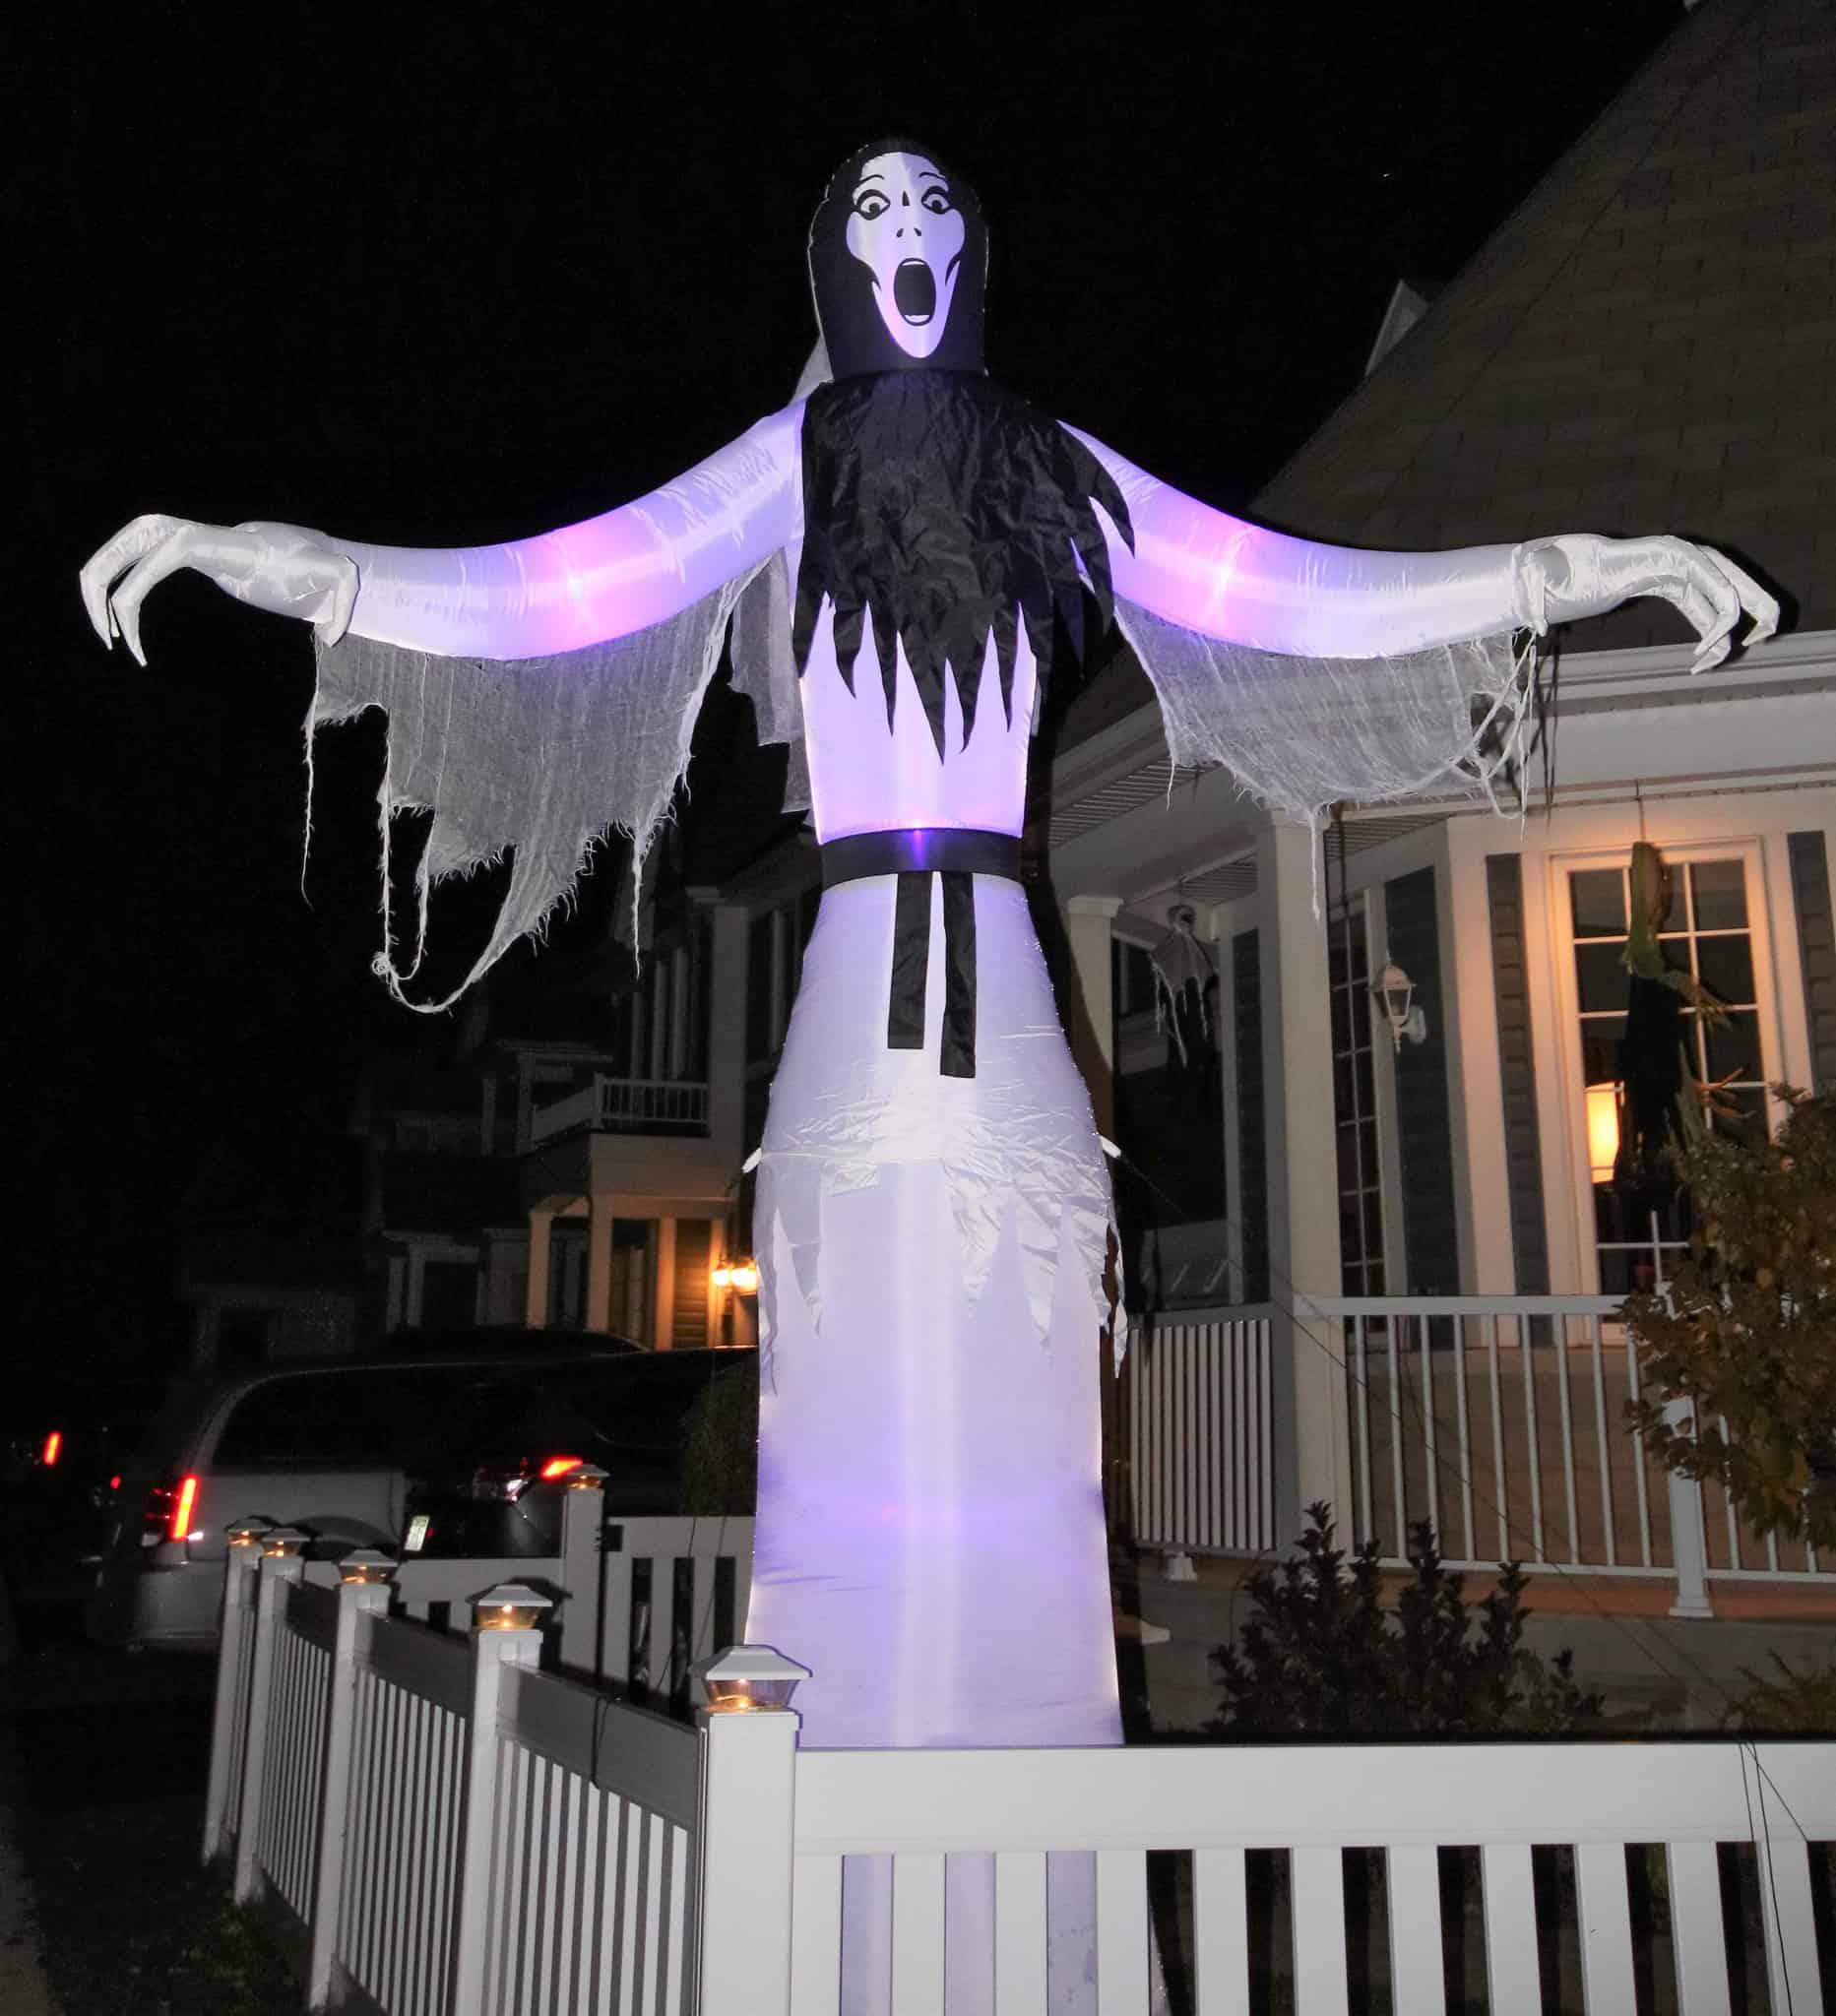 A spooky halloween greeter